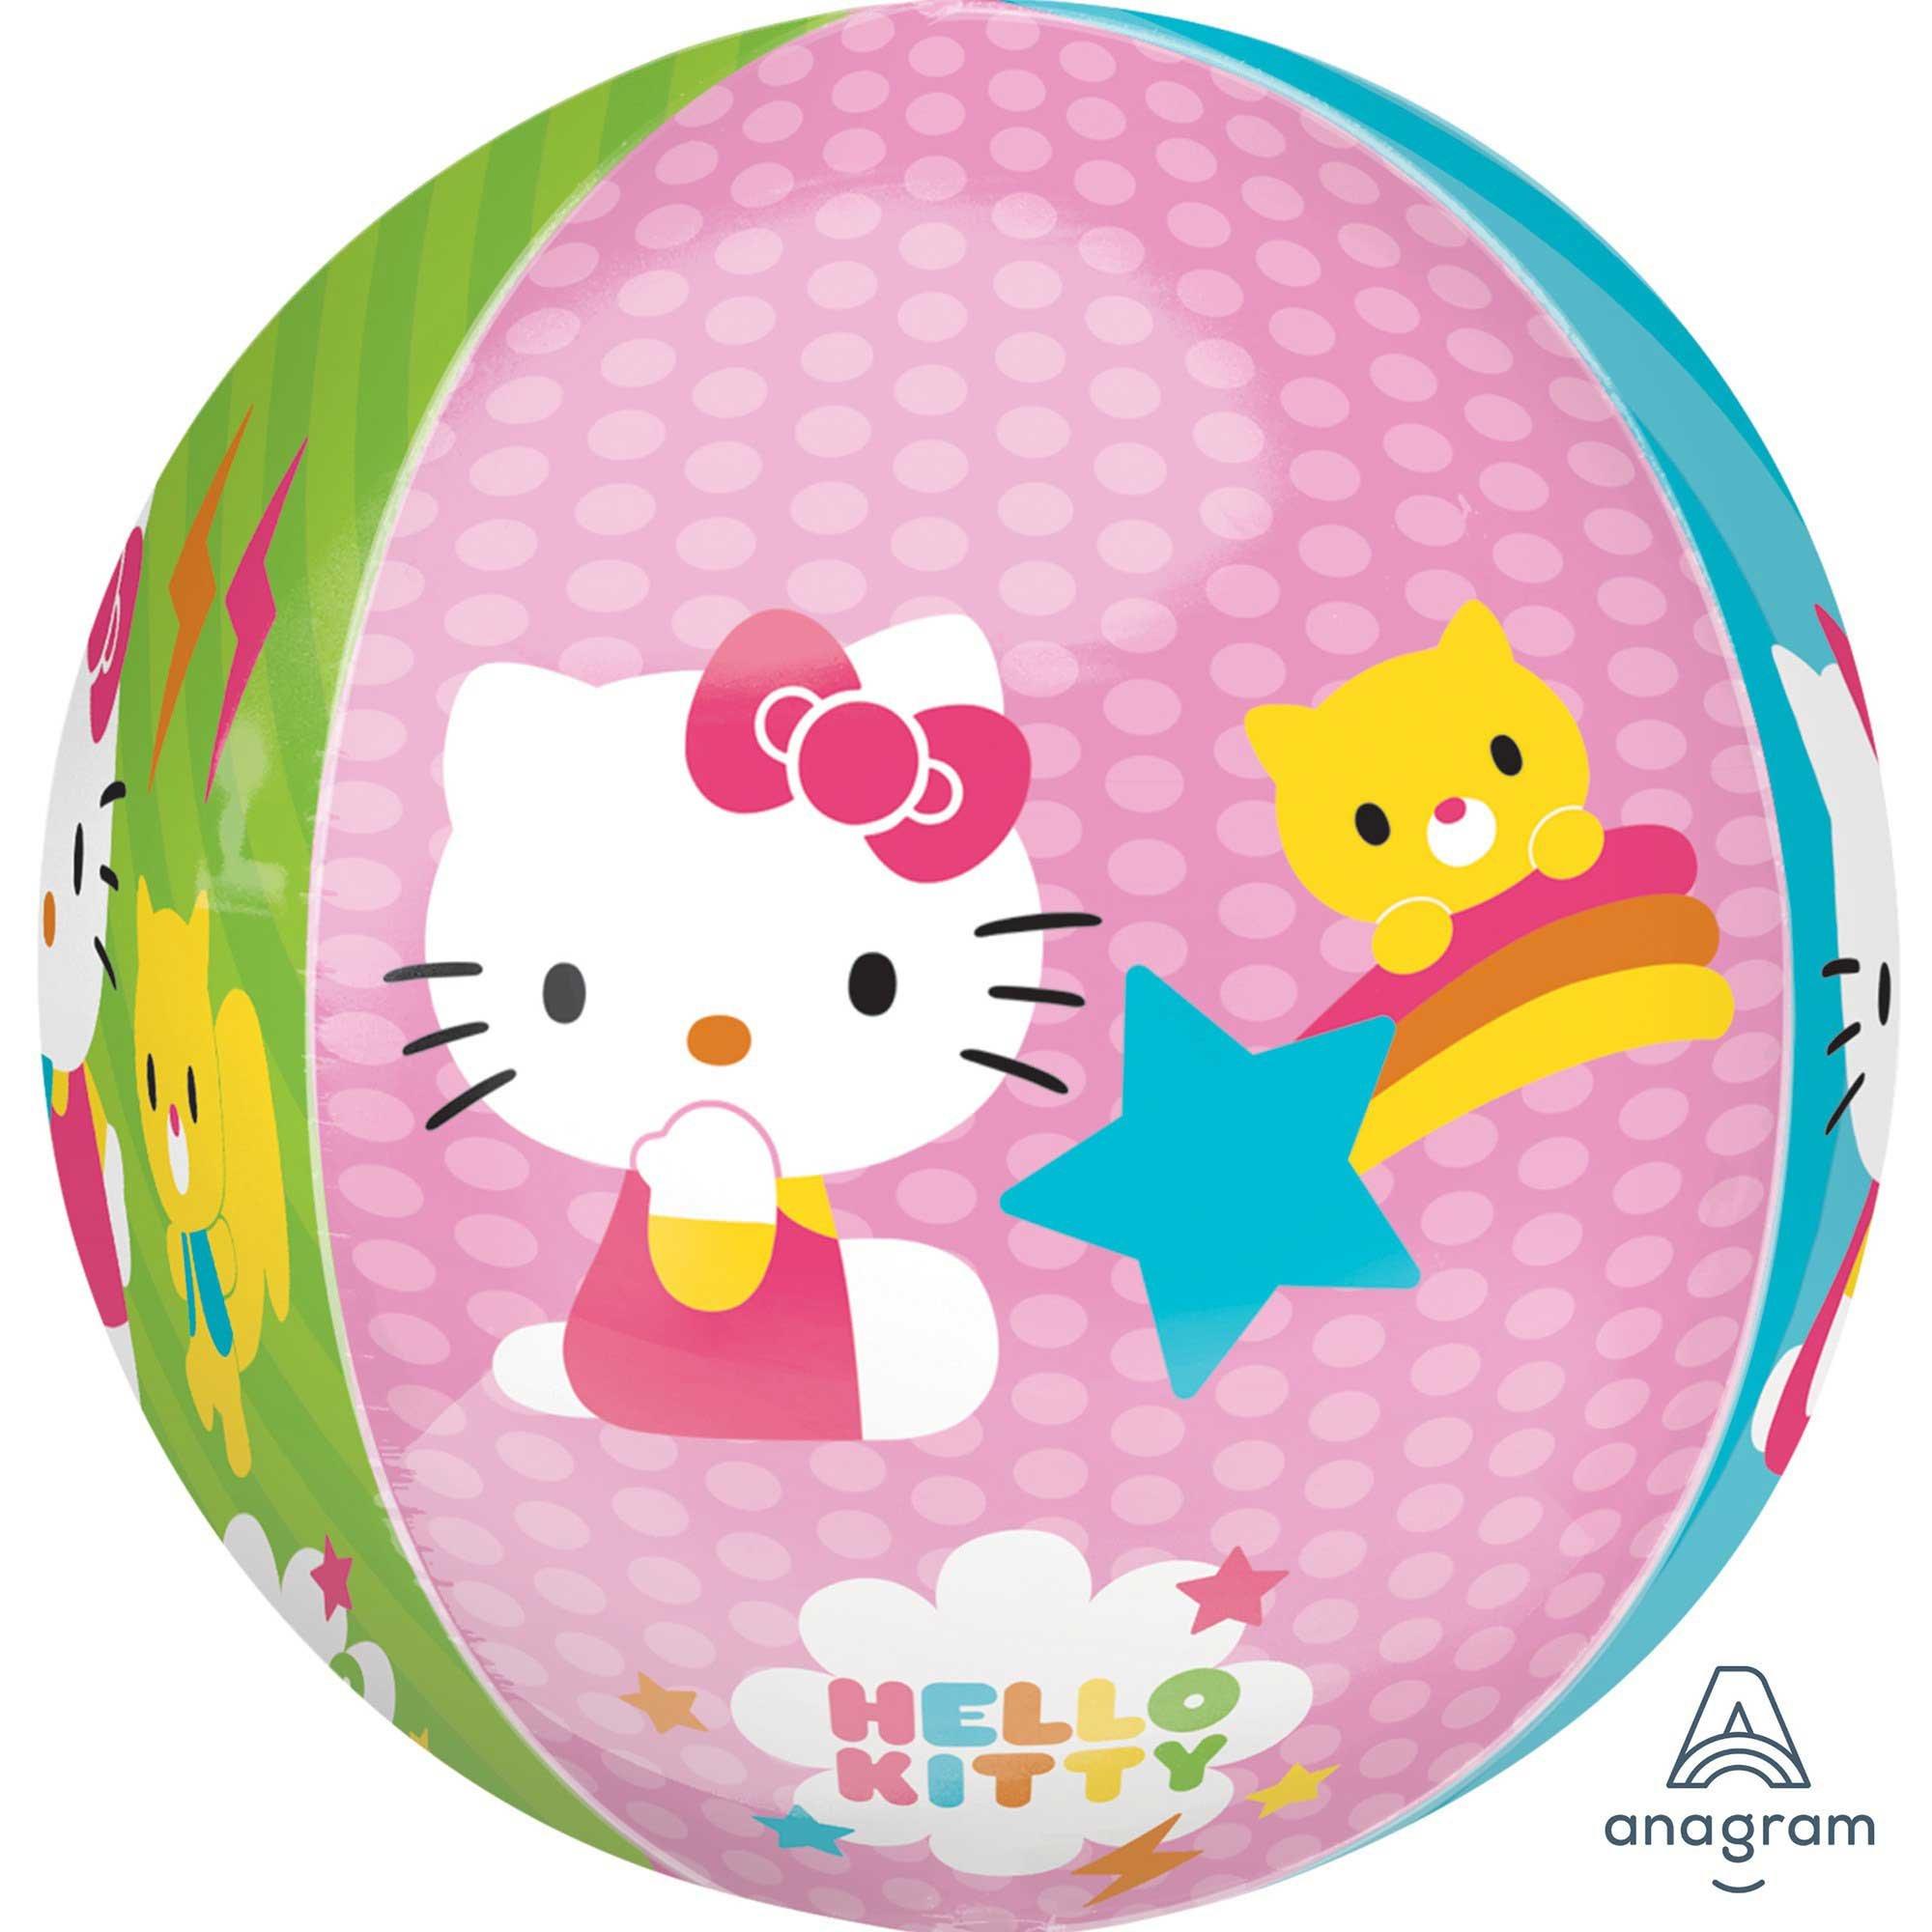 Orbz XL Hello Kitty G40